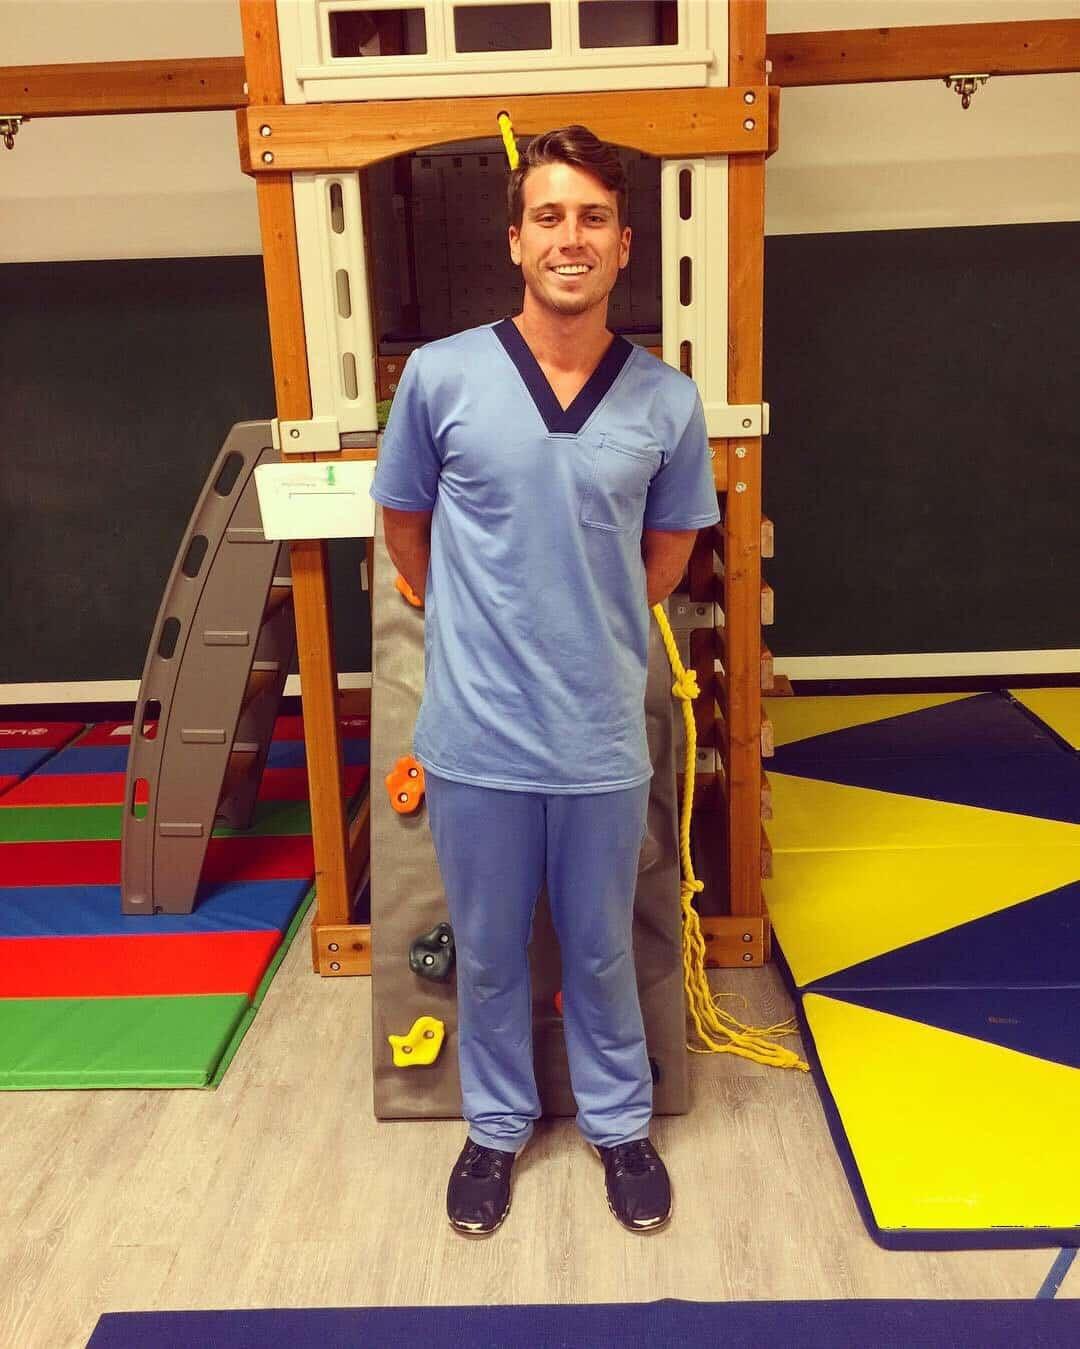 Keiser University Graduate Now One Step Closer to Becoming Rehabilitative Clinician